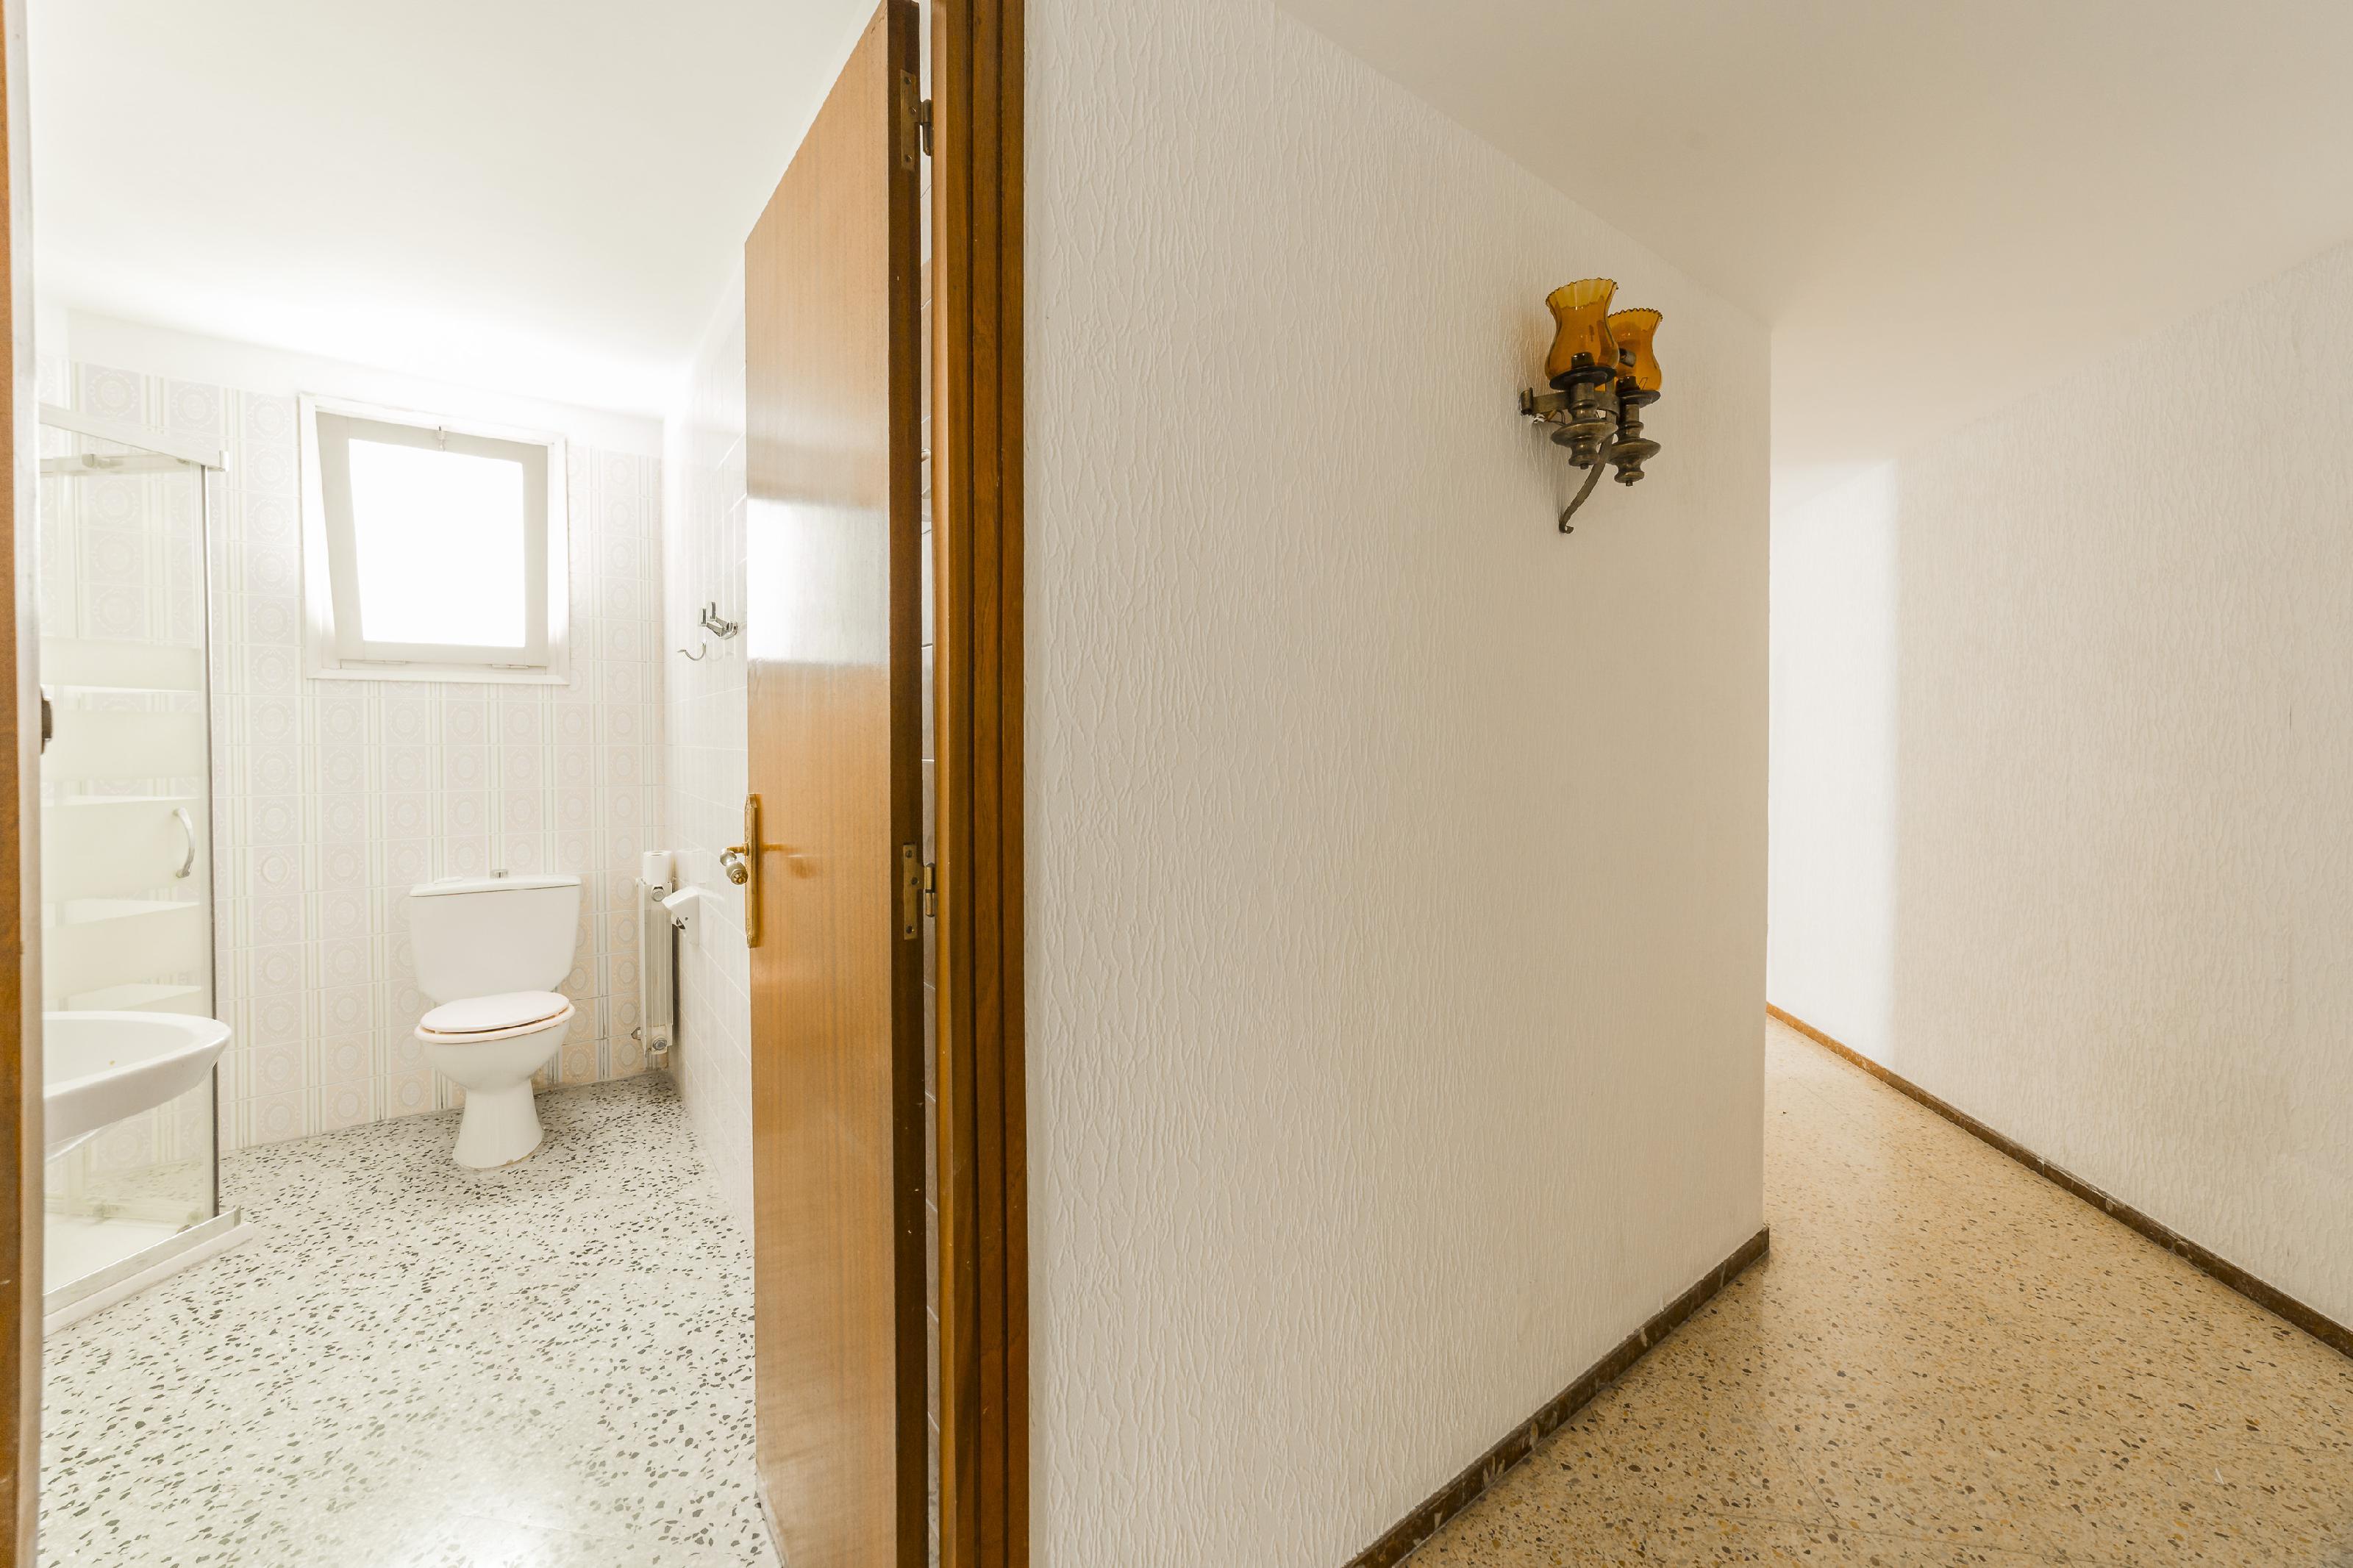 247624 Flat for sale in Eixample, Sant Antoni 23